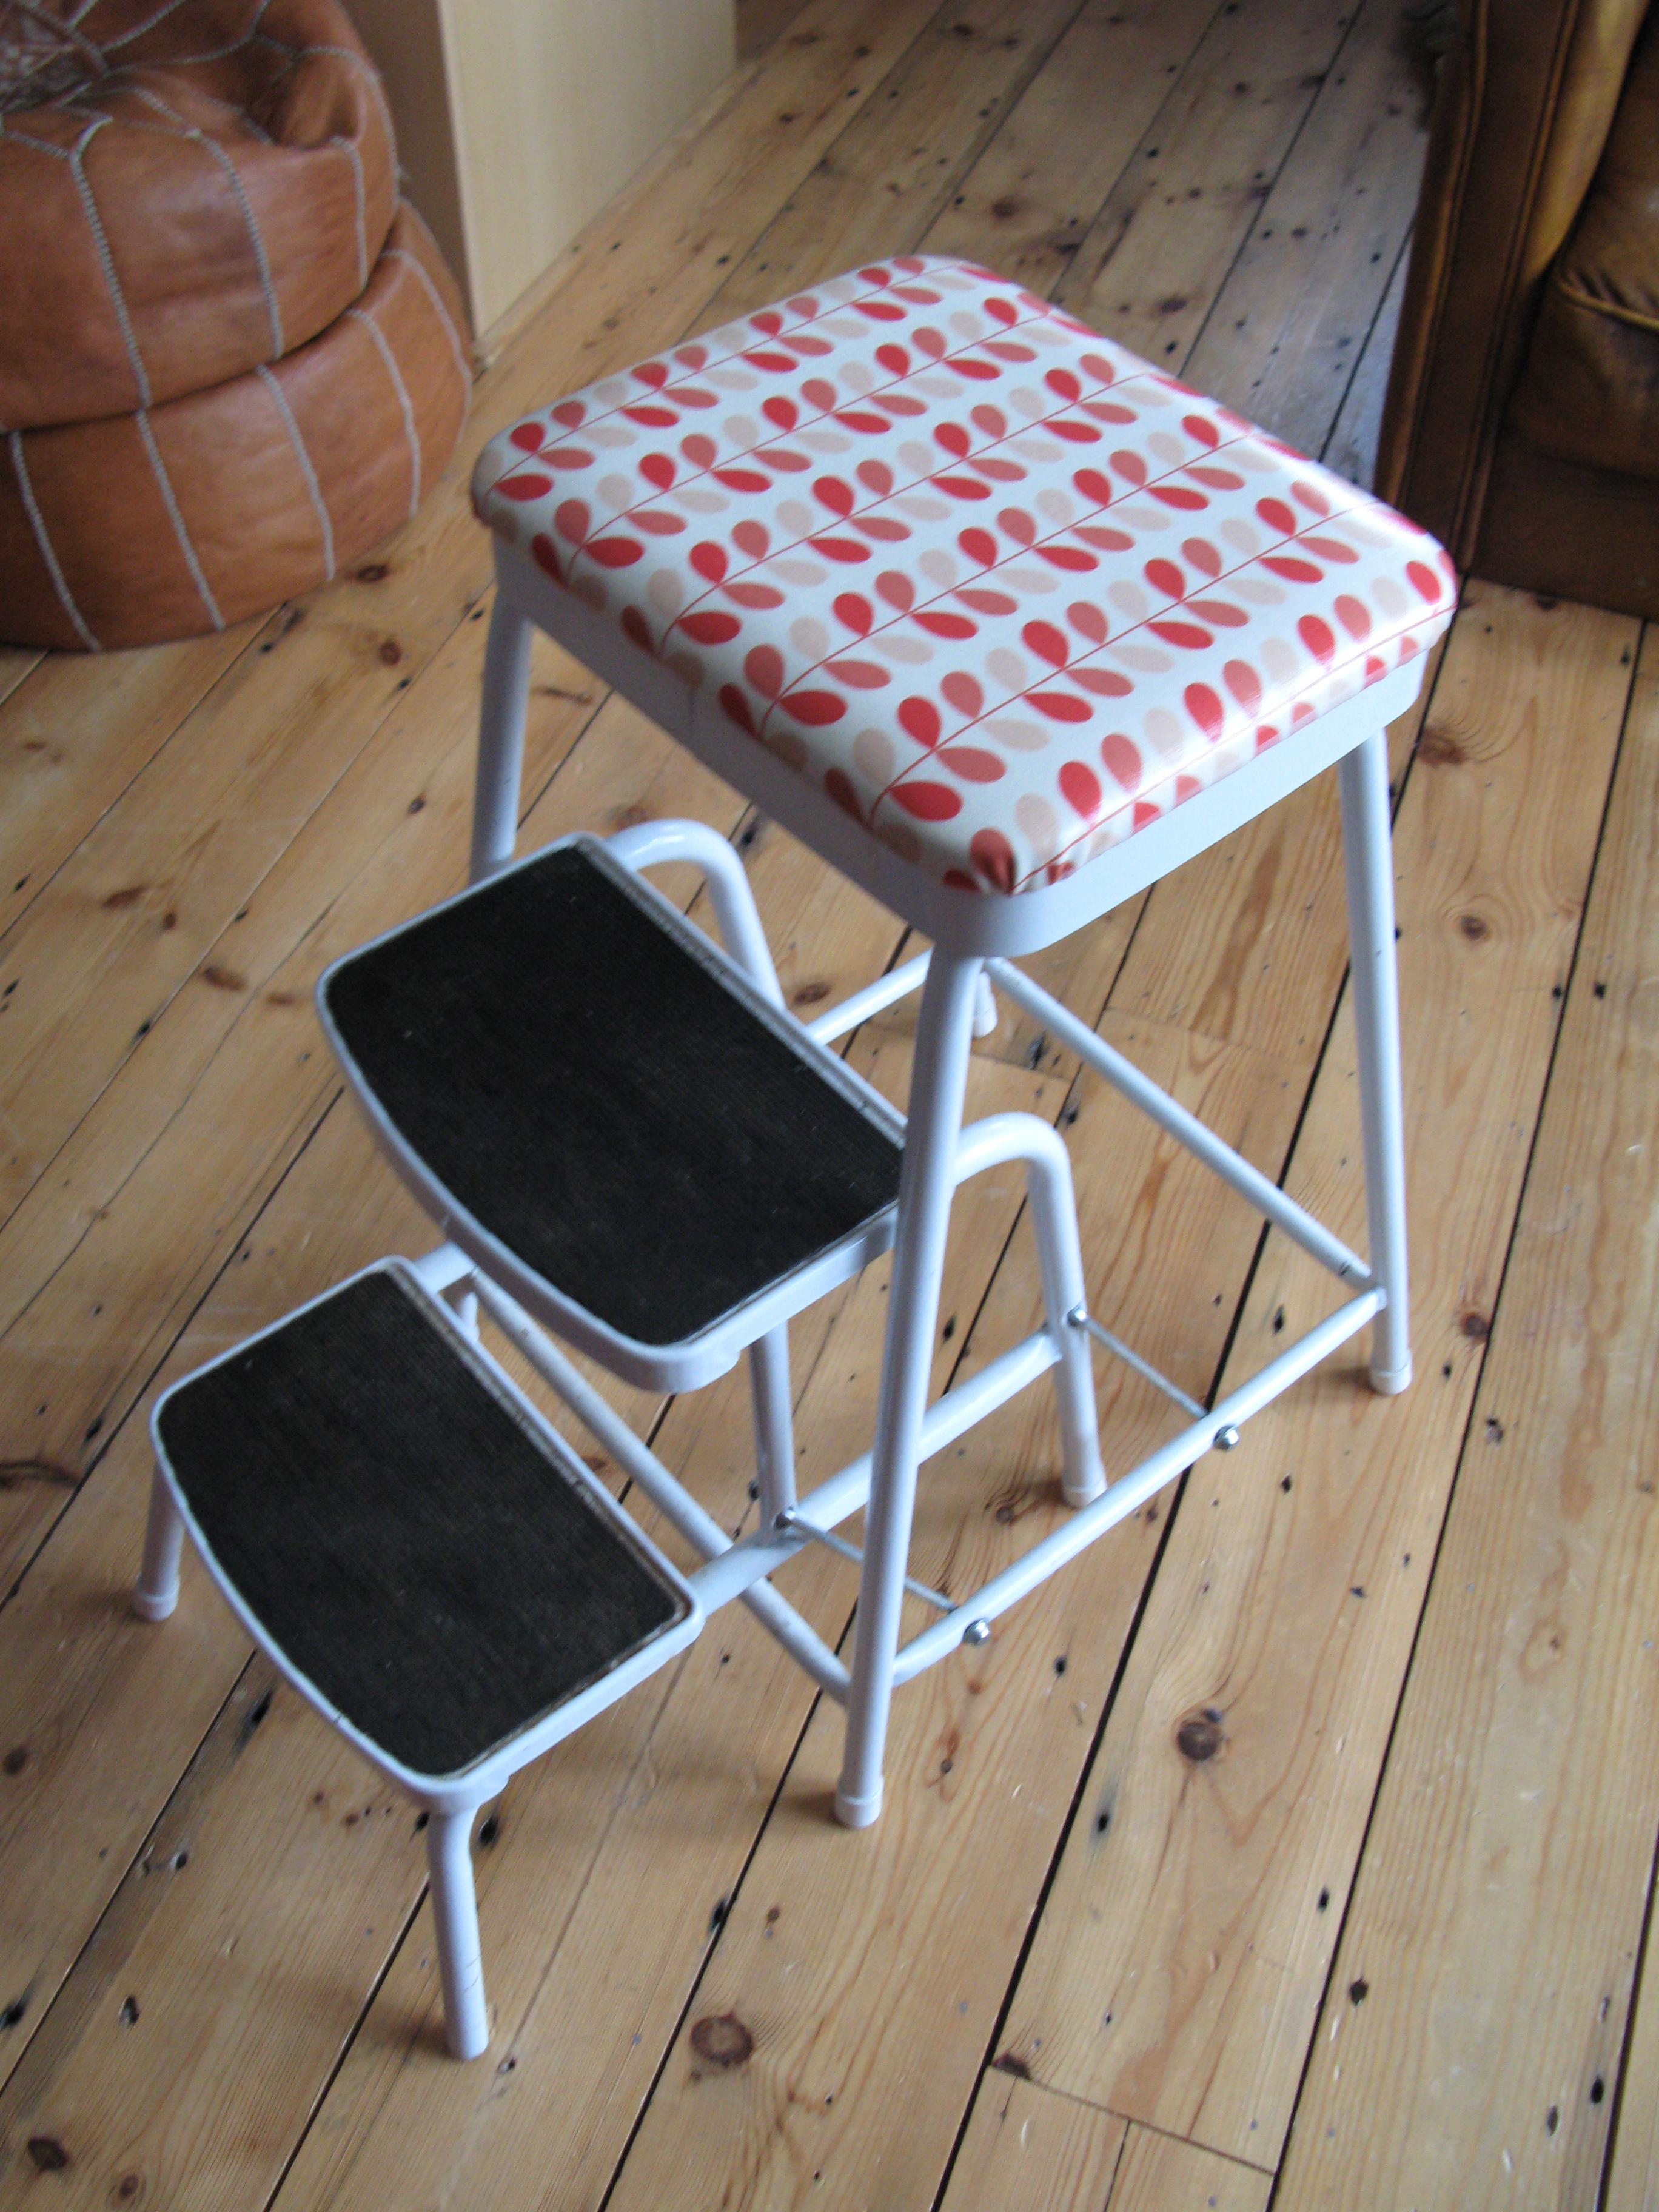 chair step stool ironing board adirondack folding chairs polywood stepladder 717x590 animated designporn